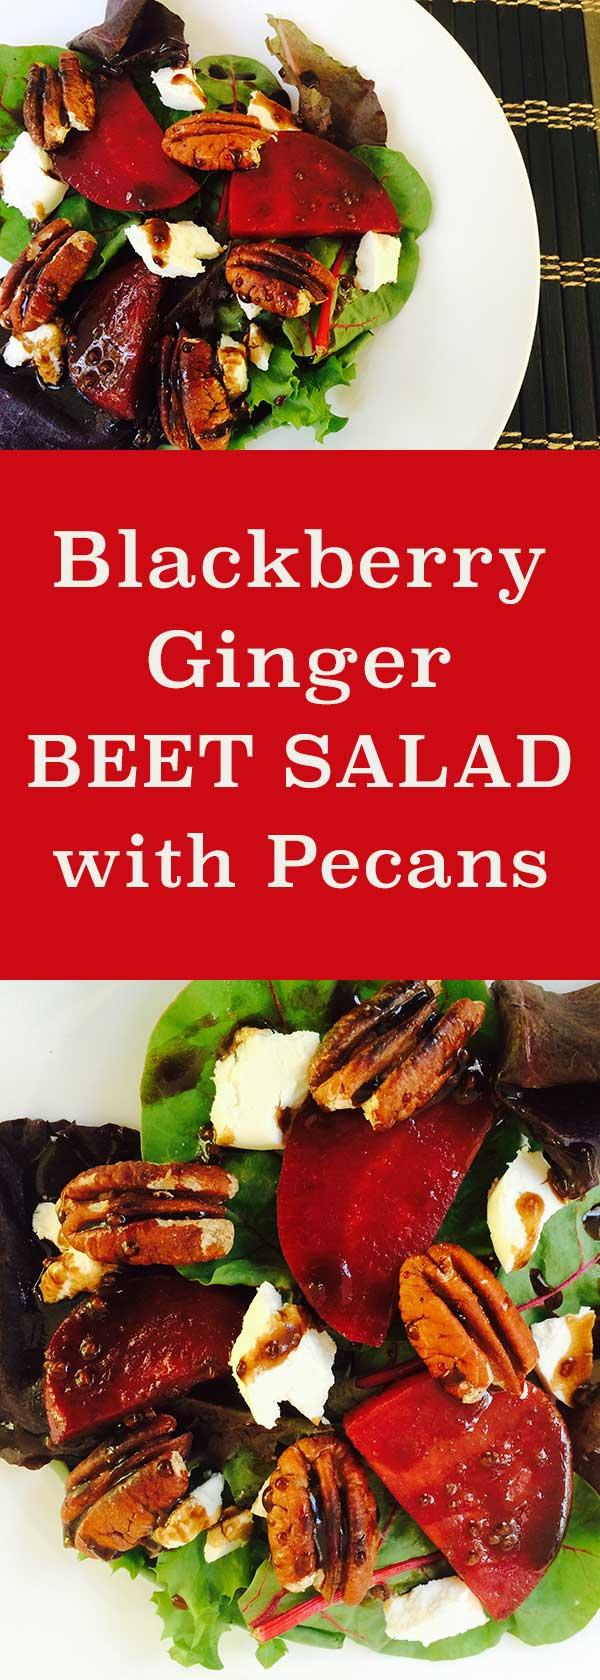 Blackberry Ginger Beet Salad with Pecans | diabeticfoodie.com